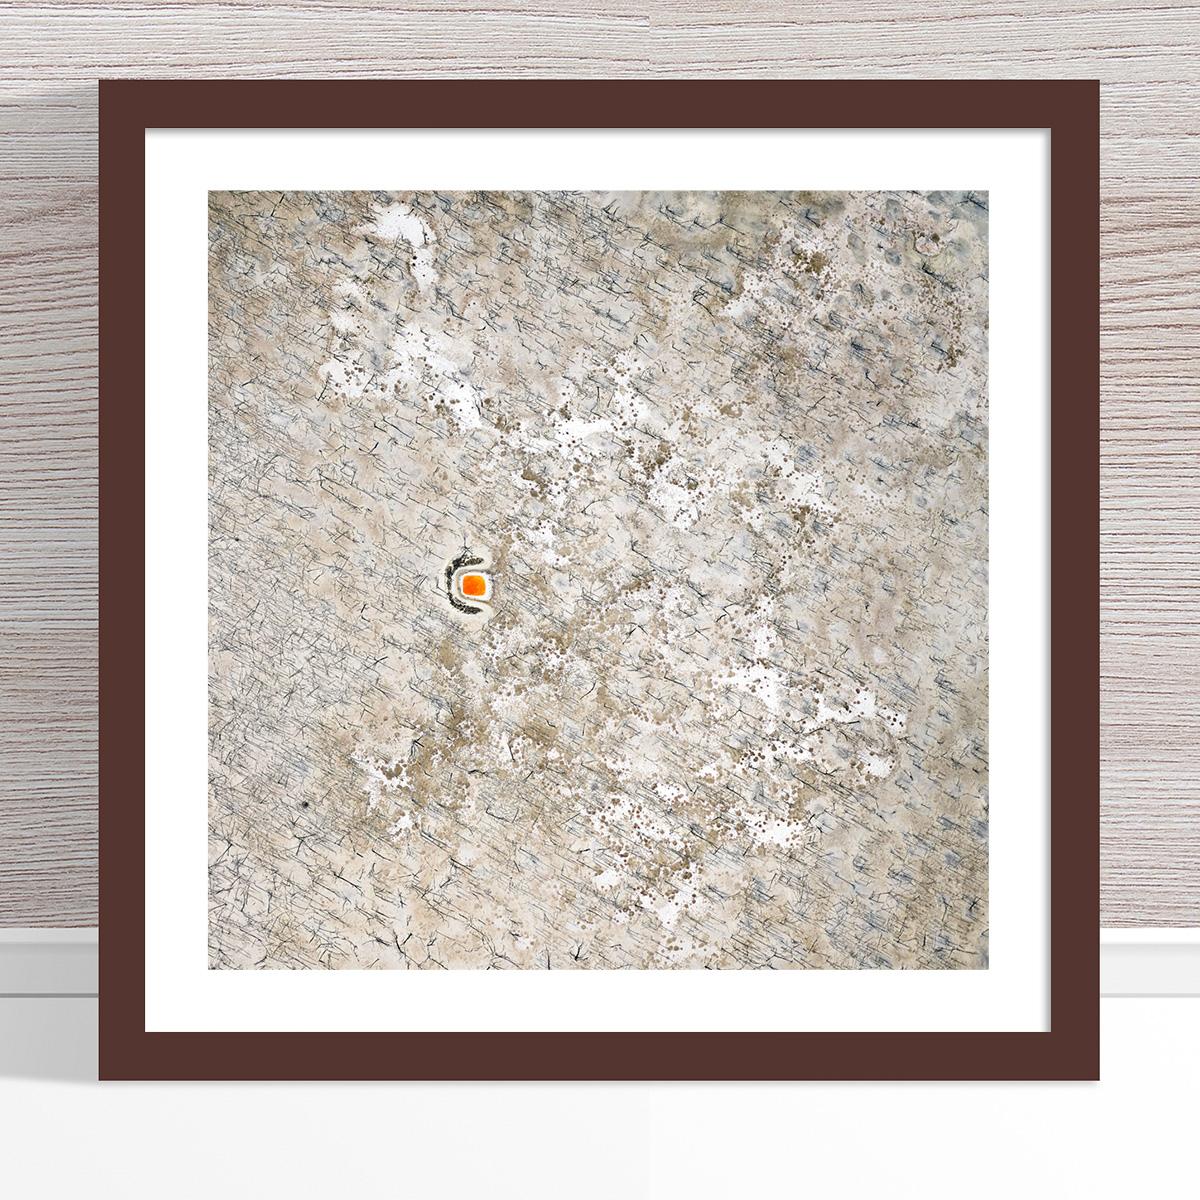 Chris Saunders - 'Aerial Outback 008' Dark Frame